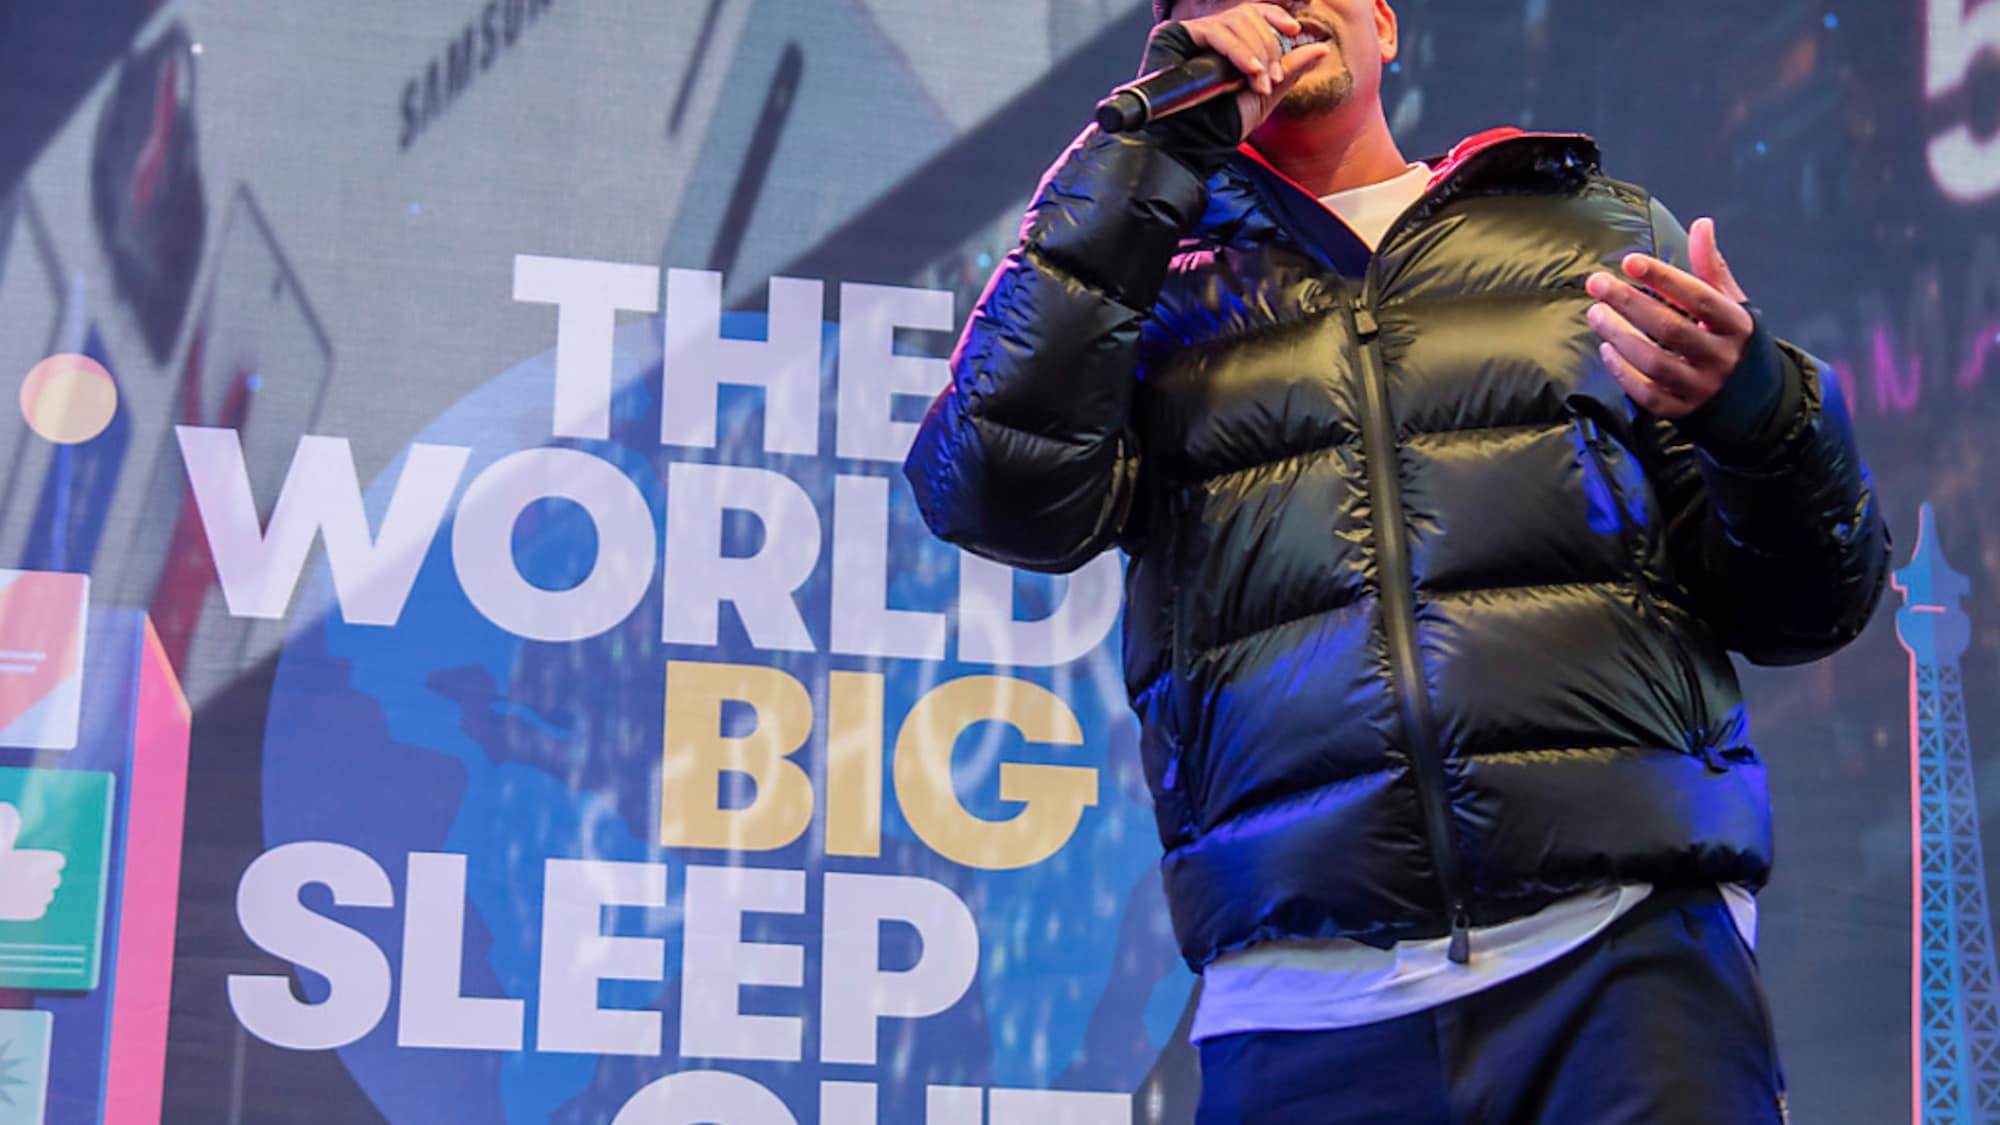 USA: Will Smith an Protestaktion gegen Obdachlosigkeit in New York